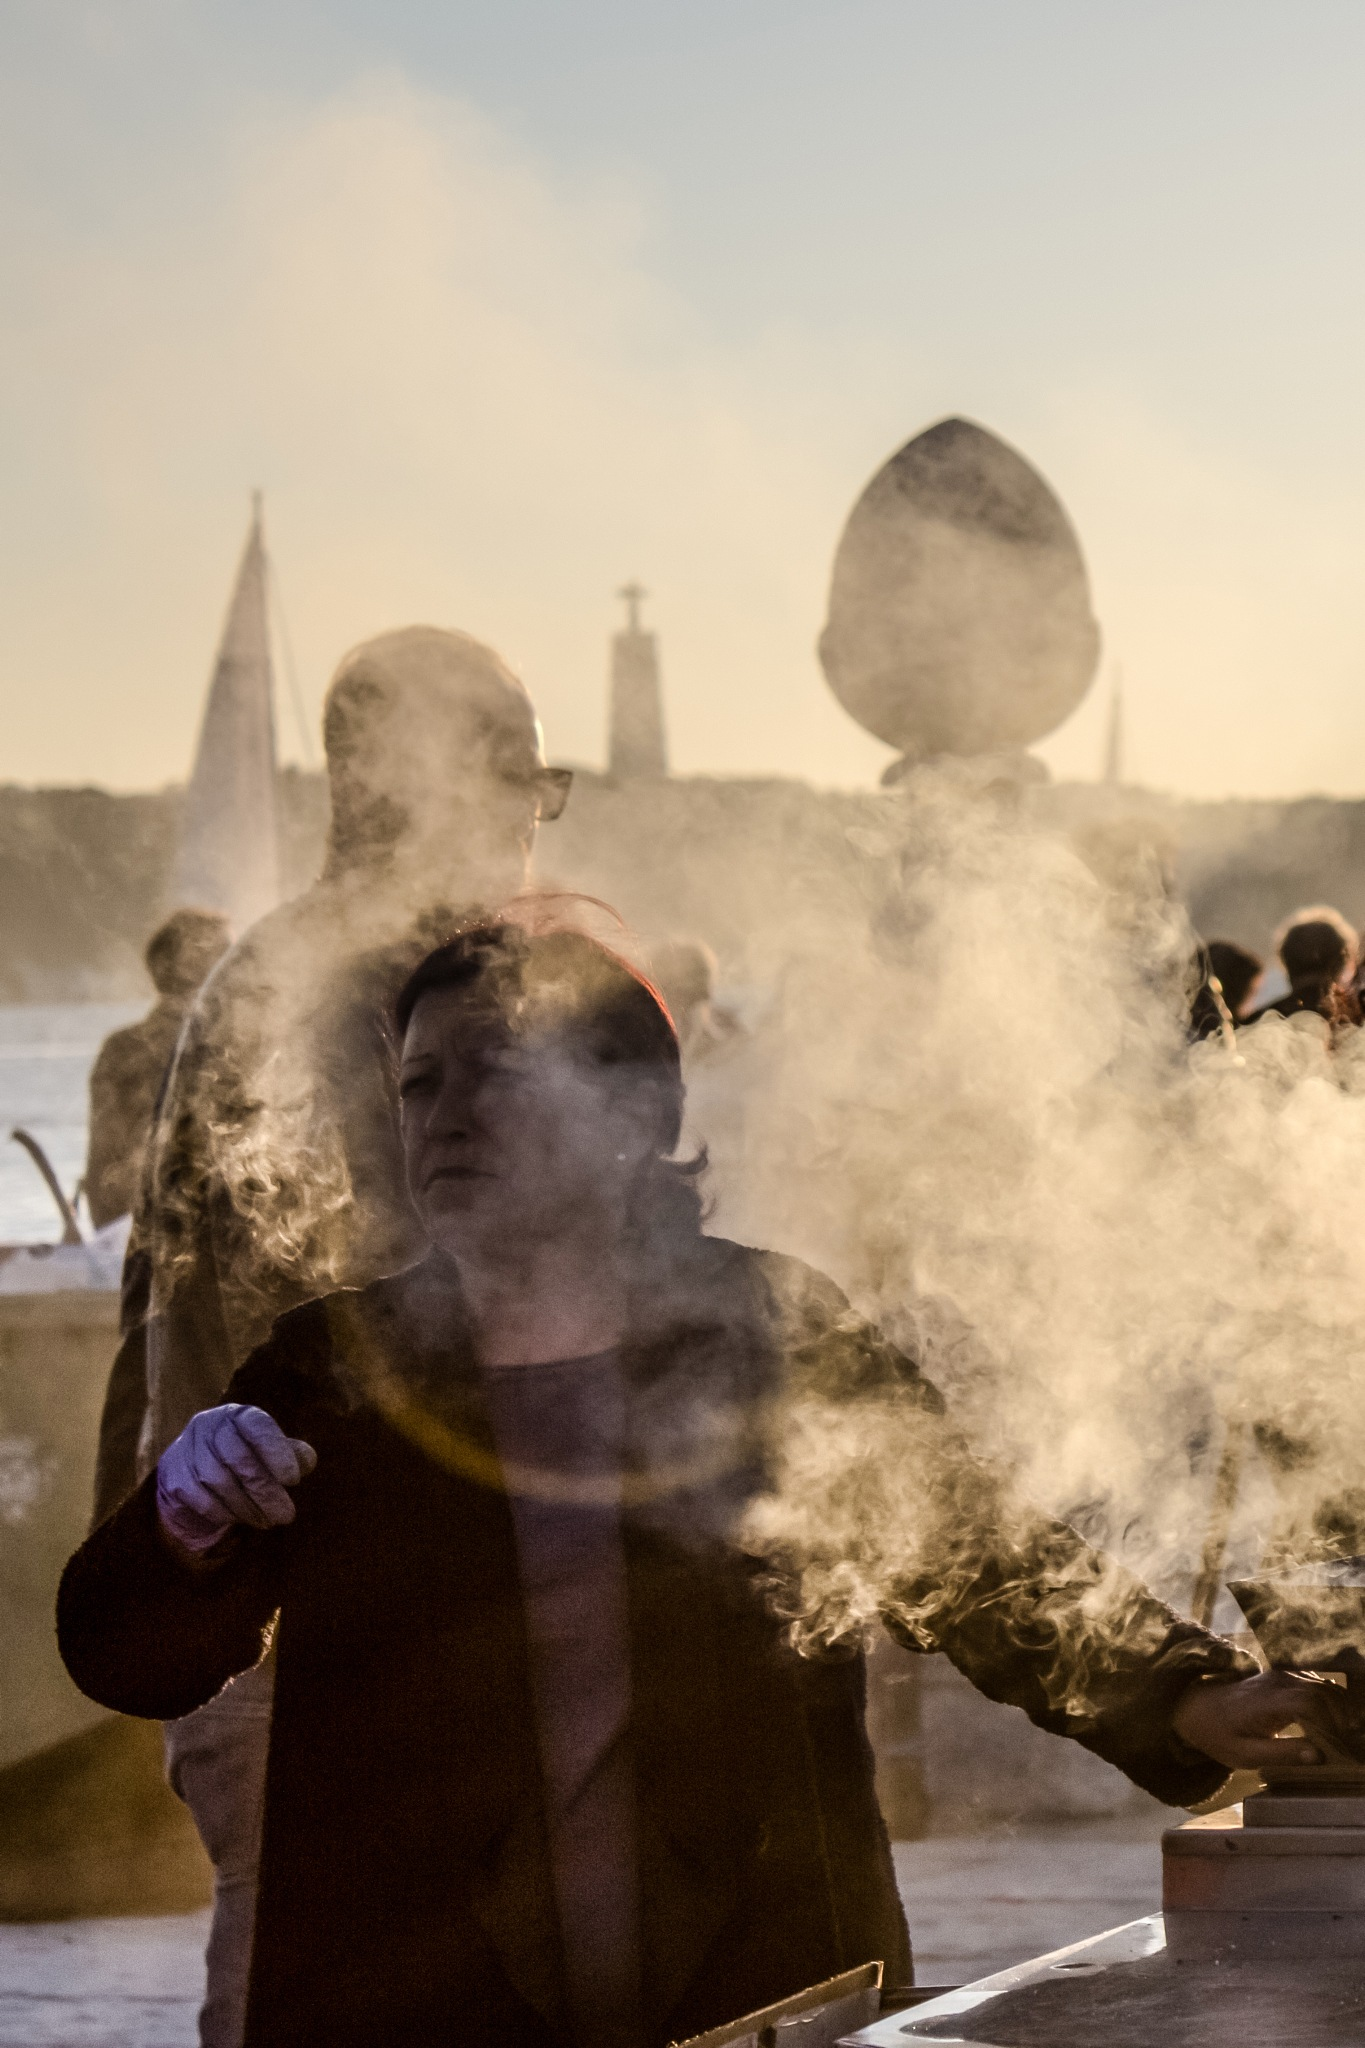 Roasted chestnut smoke in Lisbon I by Carolina Cardoso